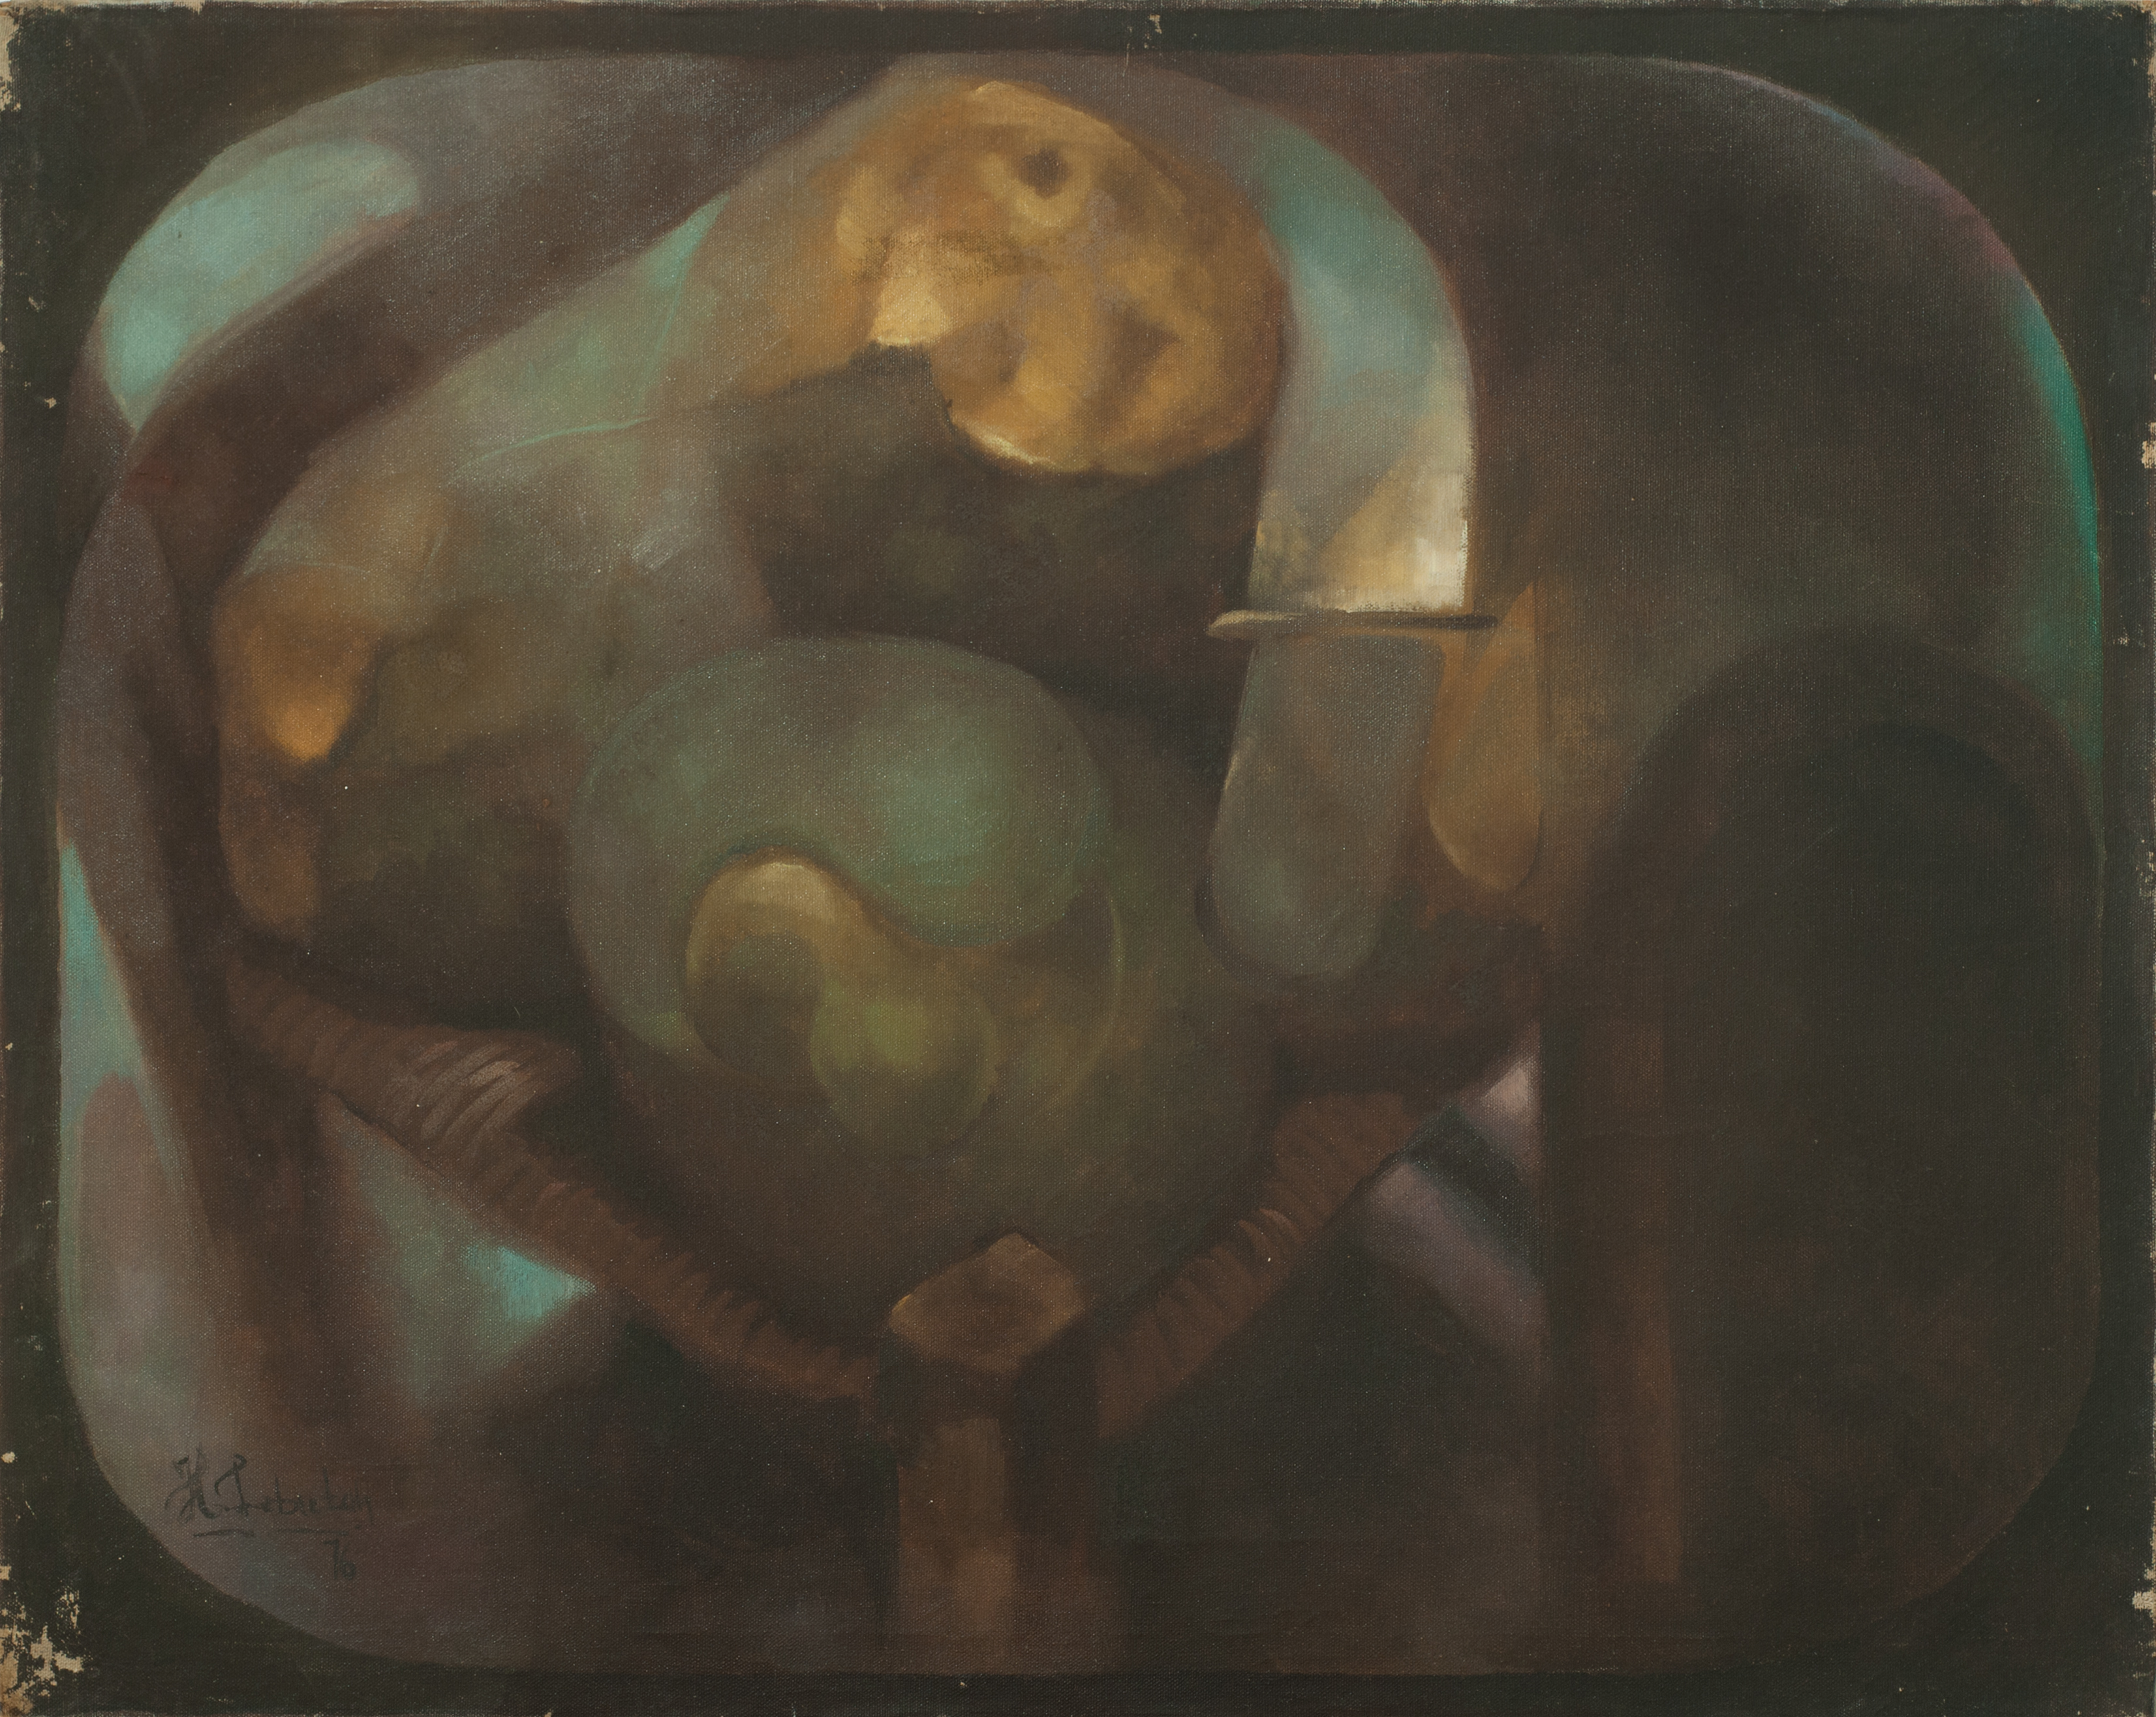 Lebreton Herve 24X30 #9-3-96 Canvas 1976